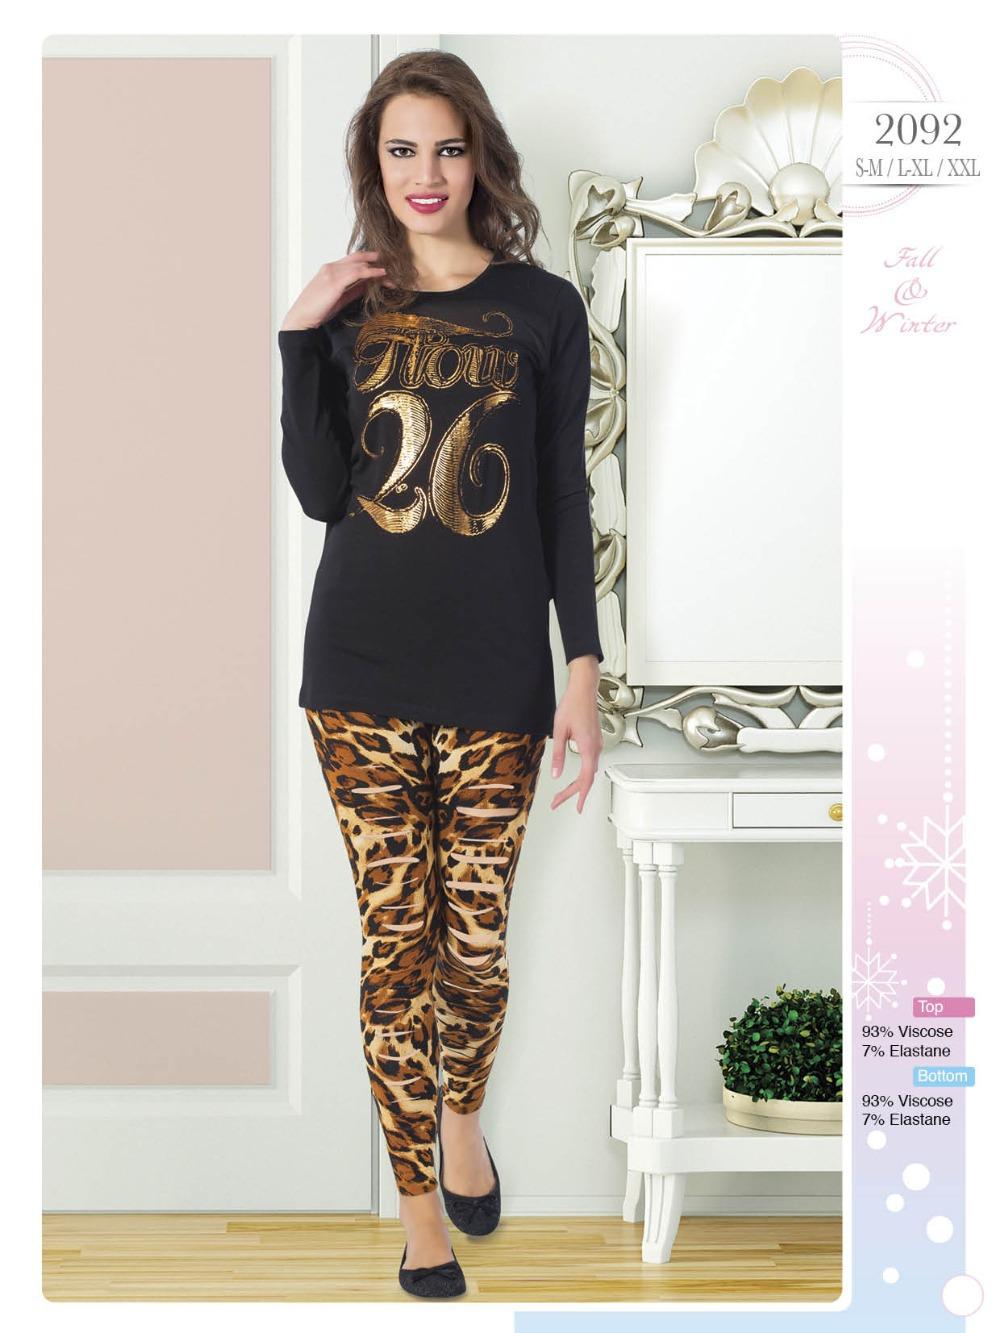 automne 2015 winter 2016 collection turque pyjamas coton femmes pyjamas femme blazers pyjamas. Black Bedroom Furniture Sets. Home Design Ideas